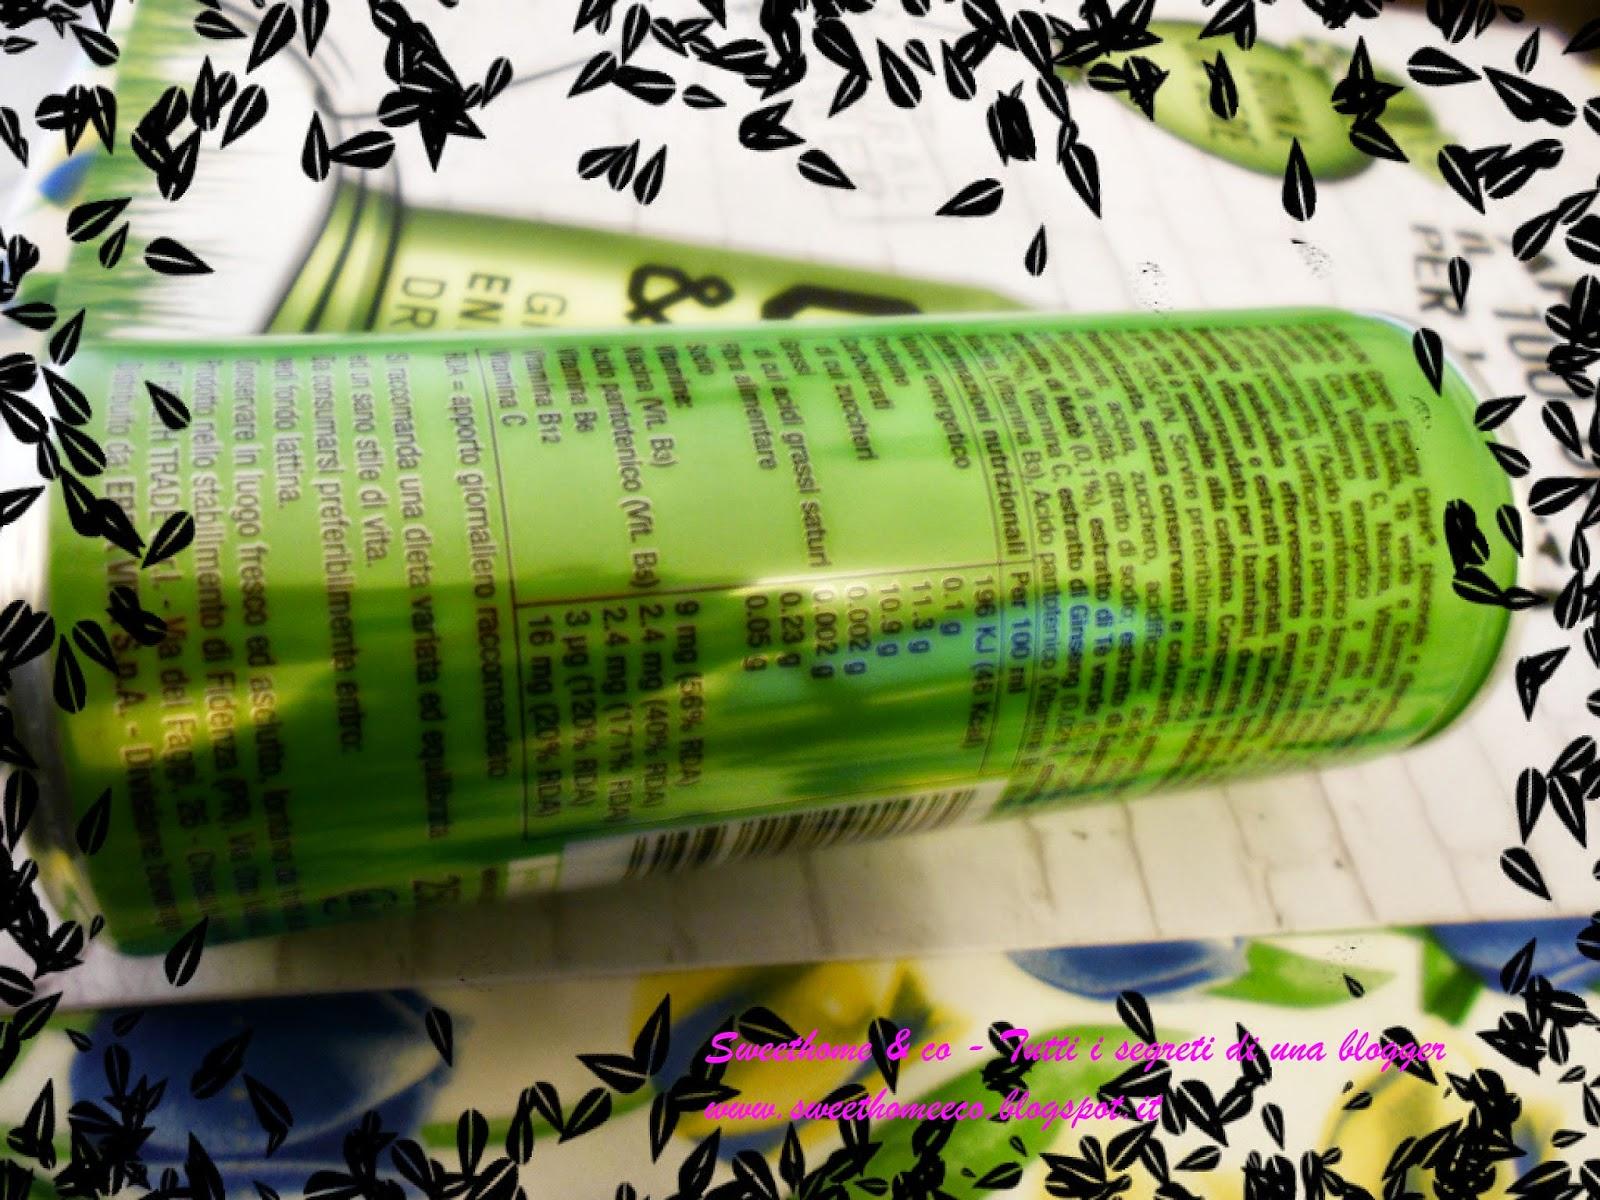 9d3c763ba8 GO & FUN GREEN ENERGY DRINK NATURAL POWER BY ERBA VITA - Recensione ...